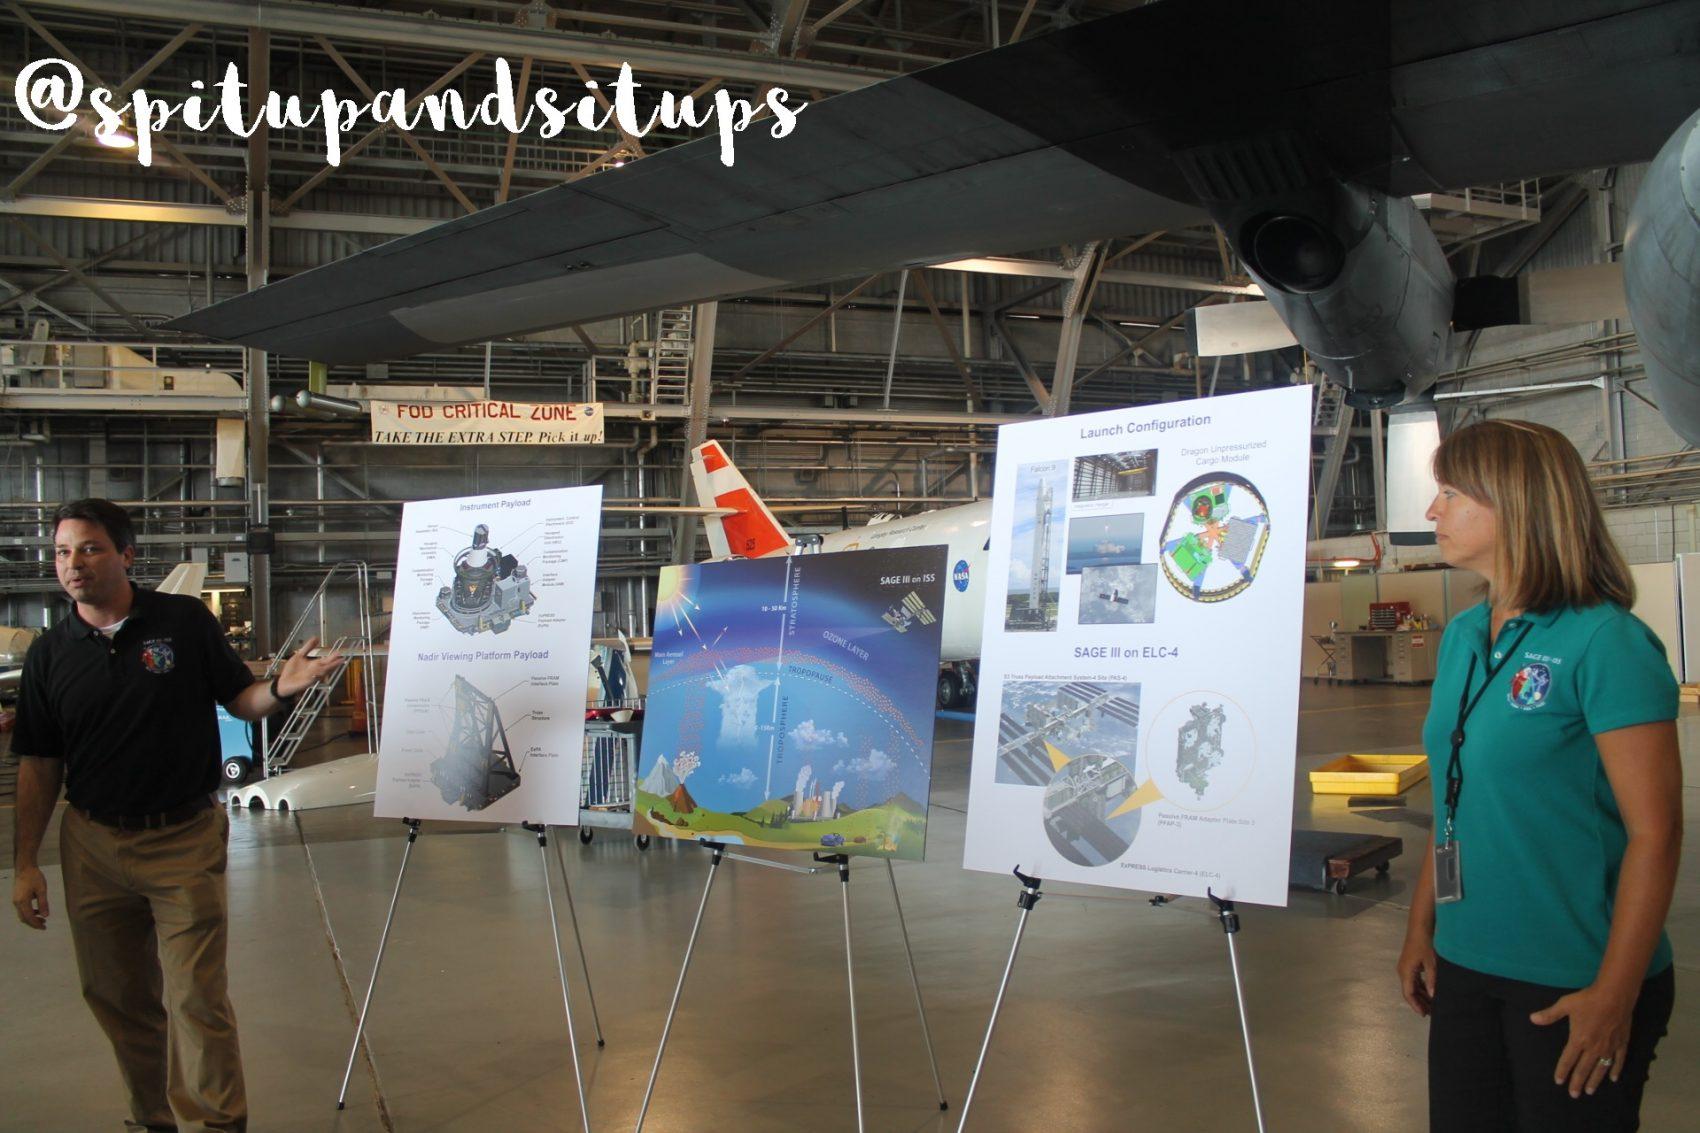 Langley Research Center Hangar 9